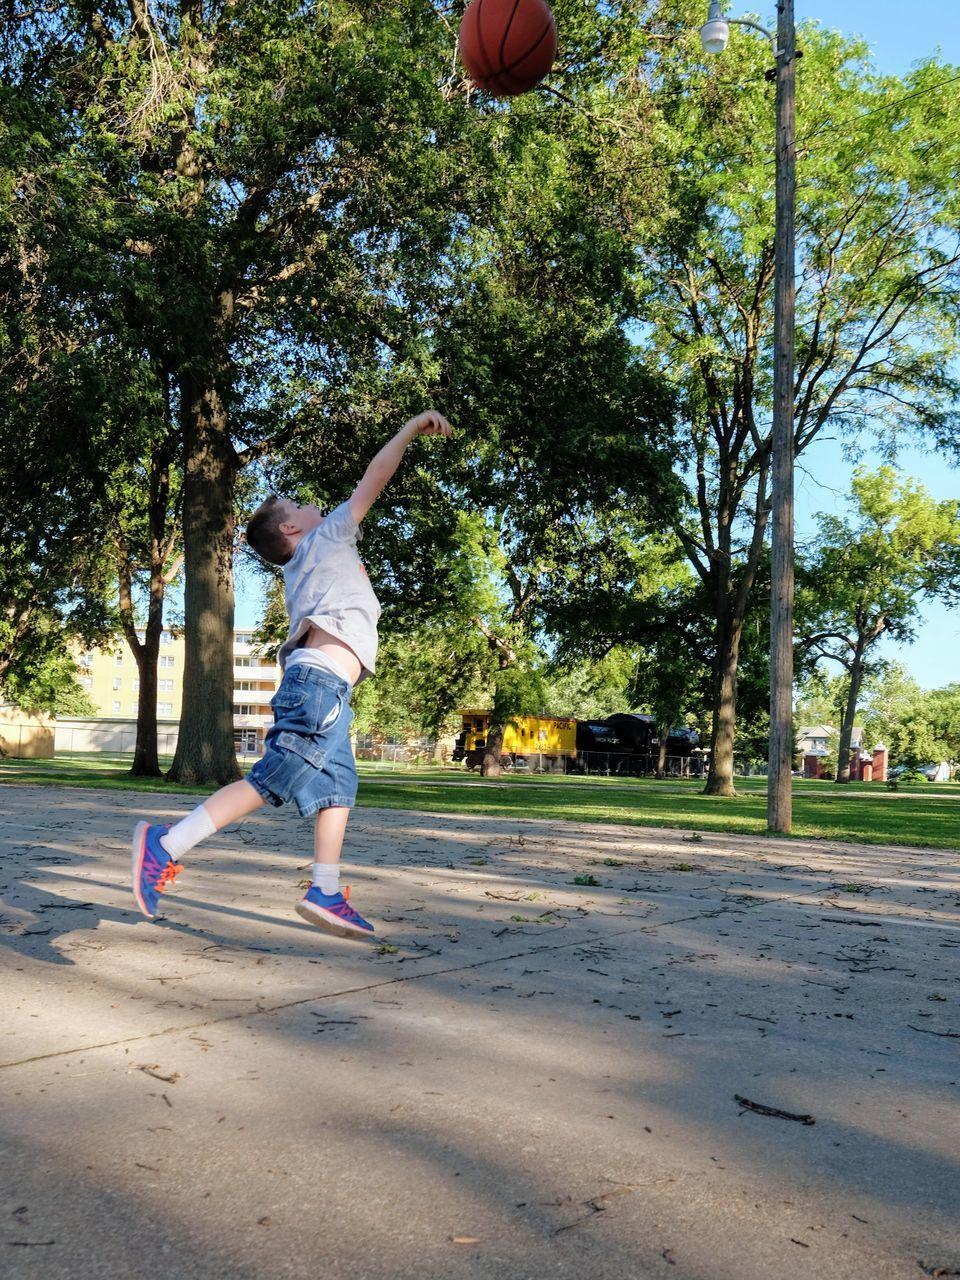 Full Length Of Boy Playing Basketball At Park